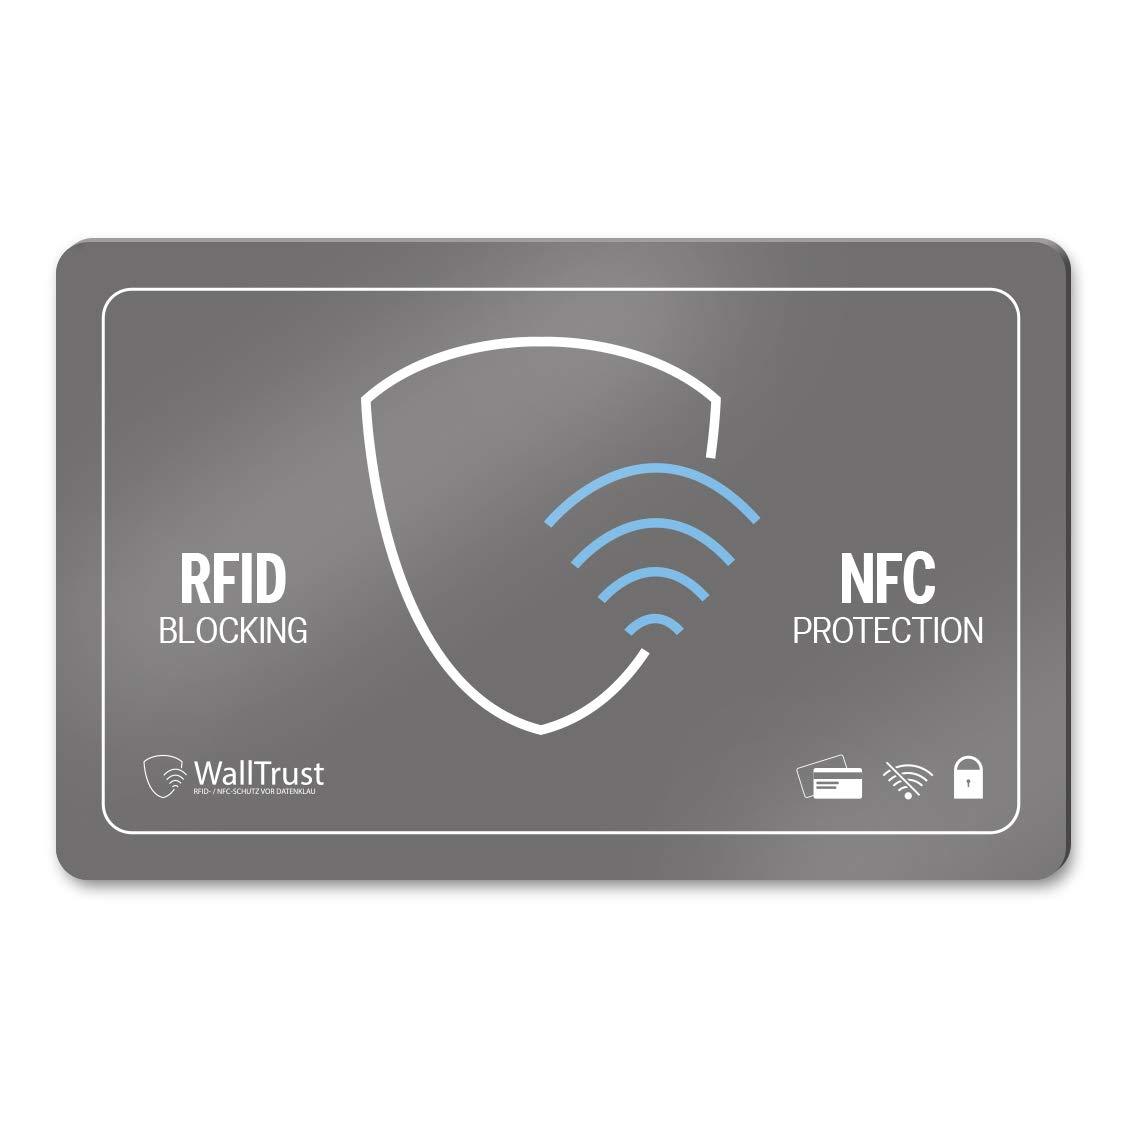 6 Stk WallTrust® RFID NFC Blocker Reisepassschutzhülle Blocking TÜV Passport